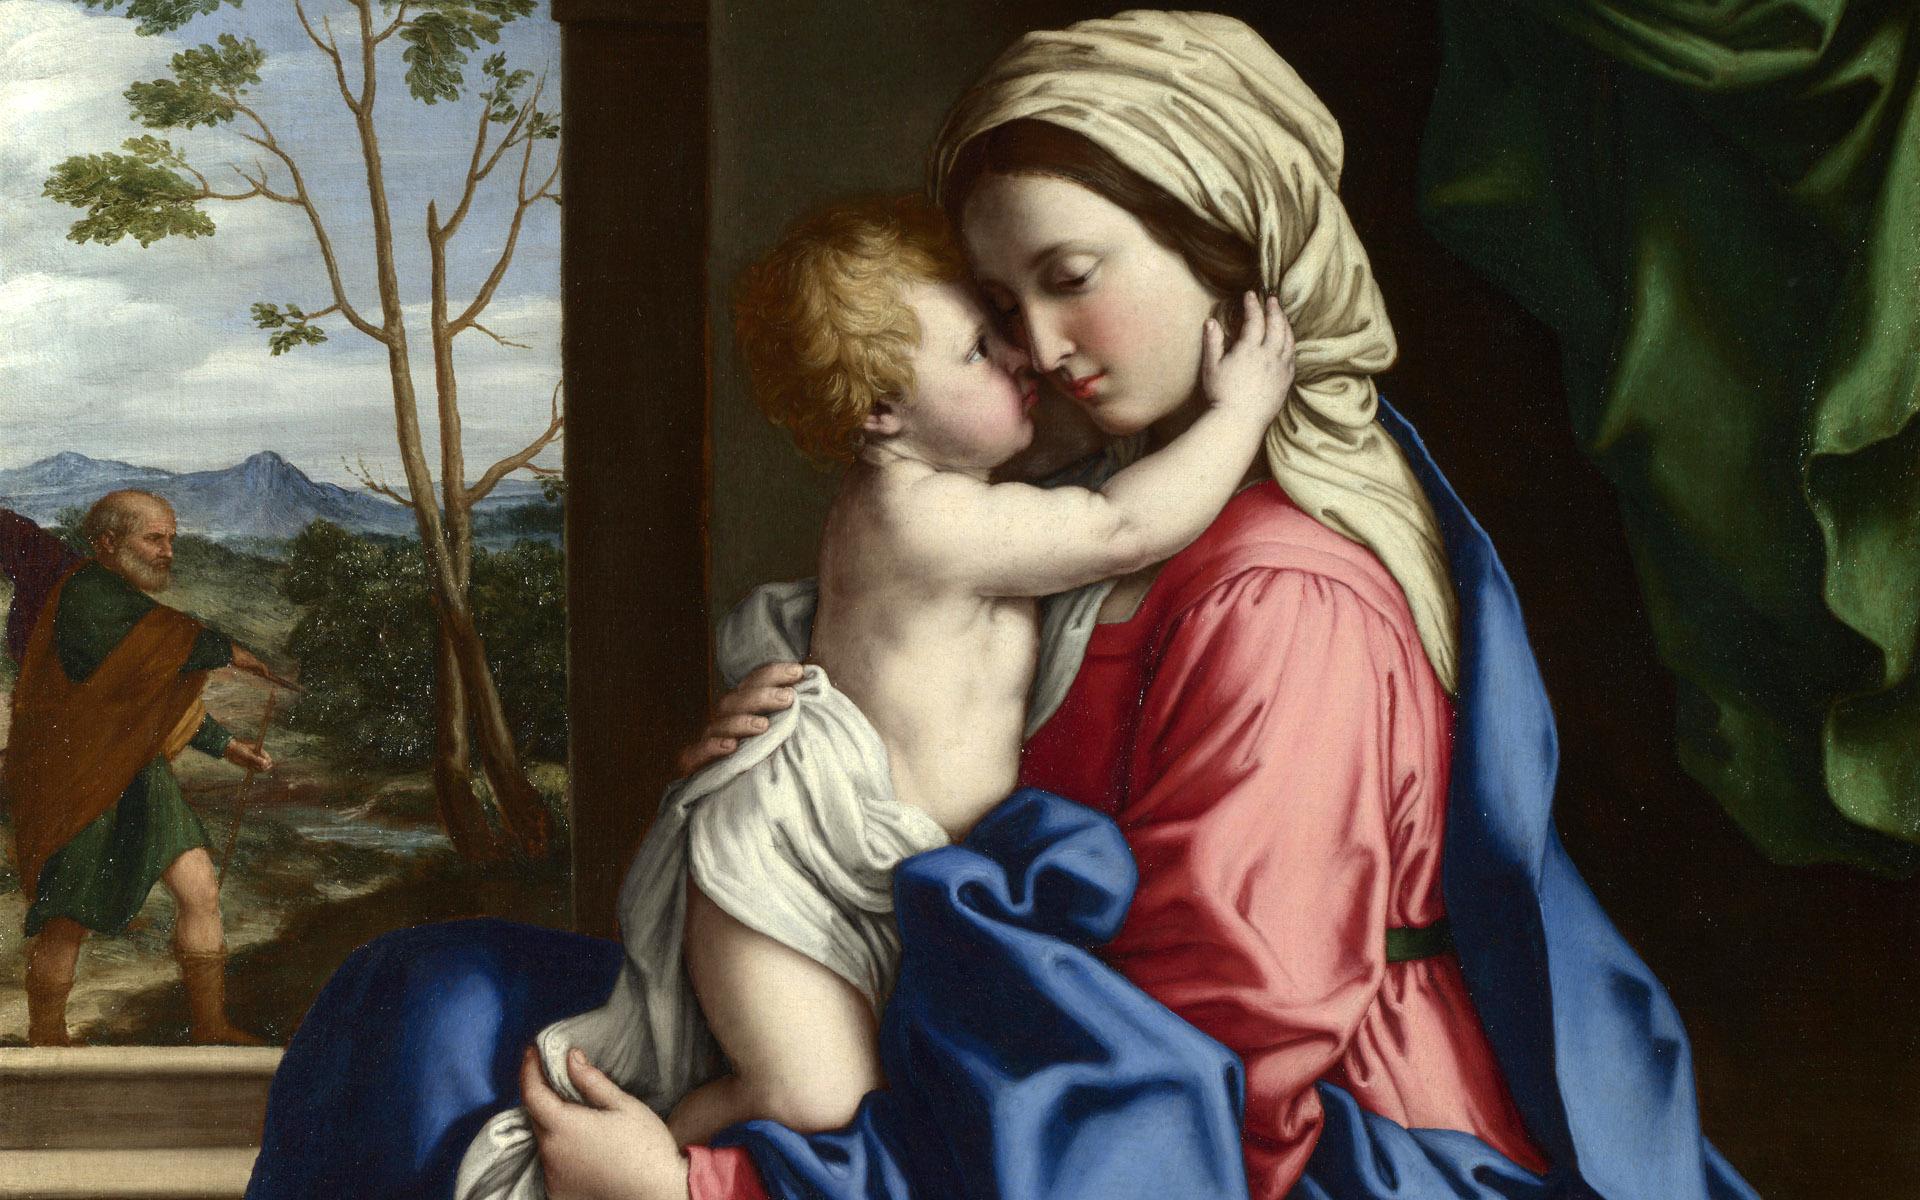 the holy mother baby jesus catholic religion wallpaper 1920x1200